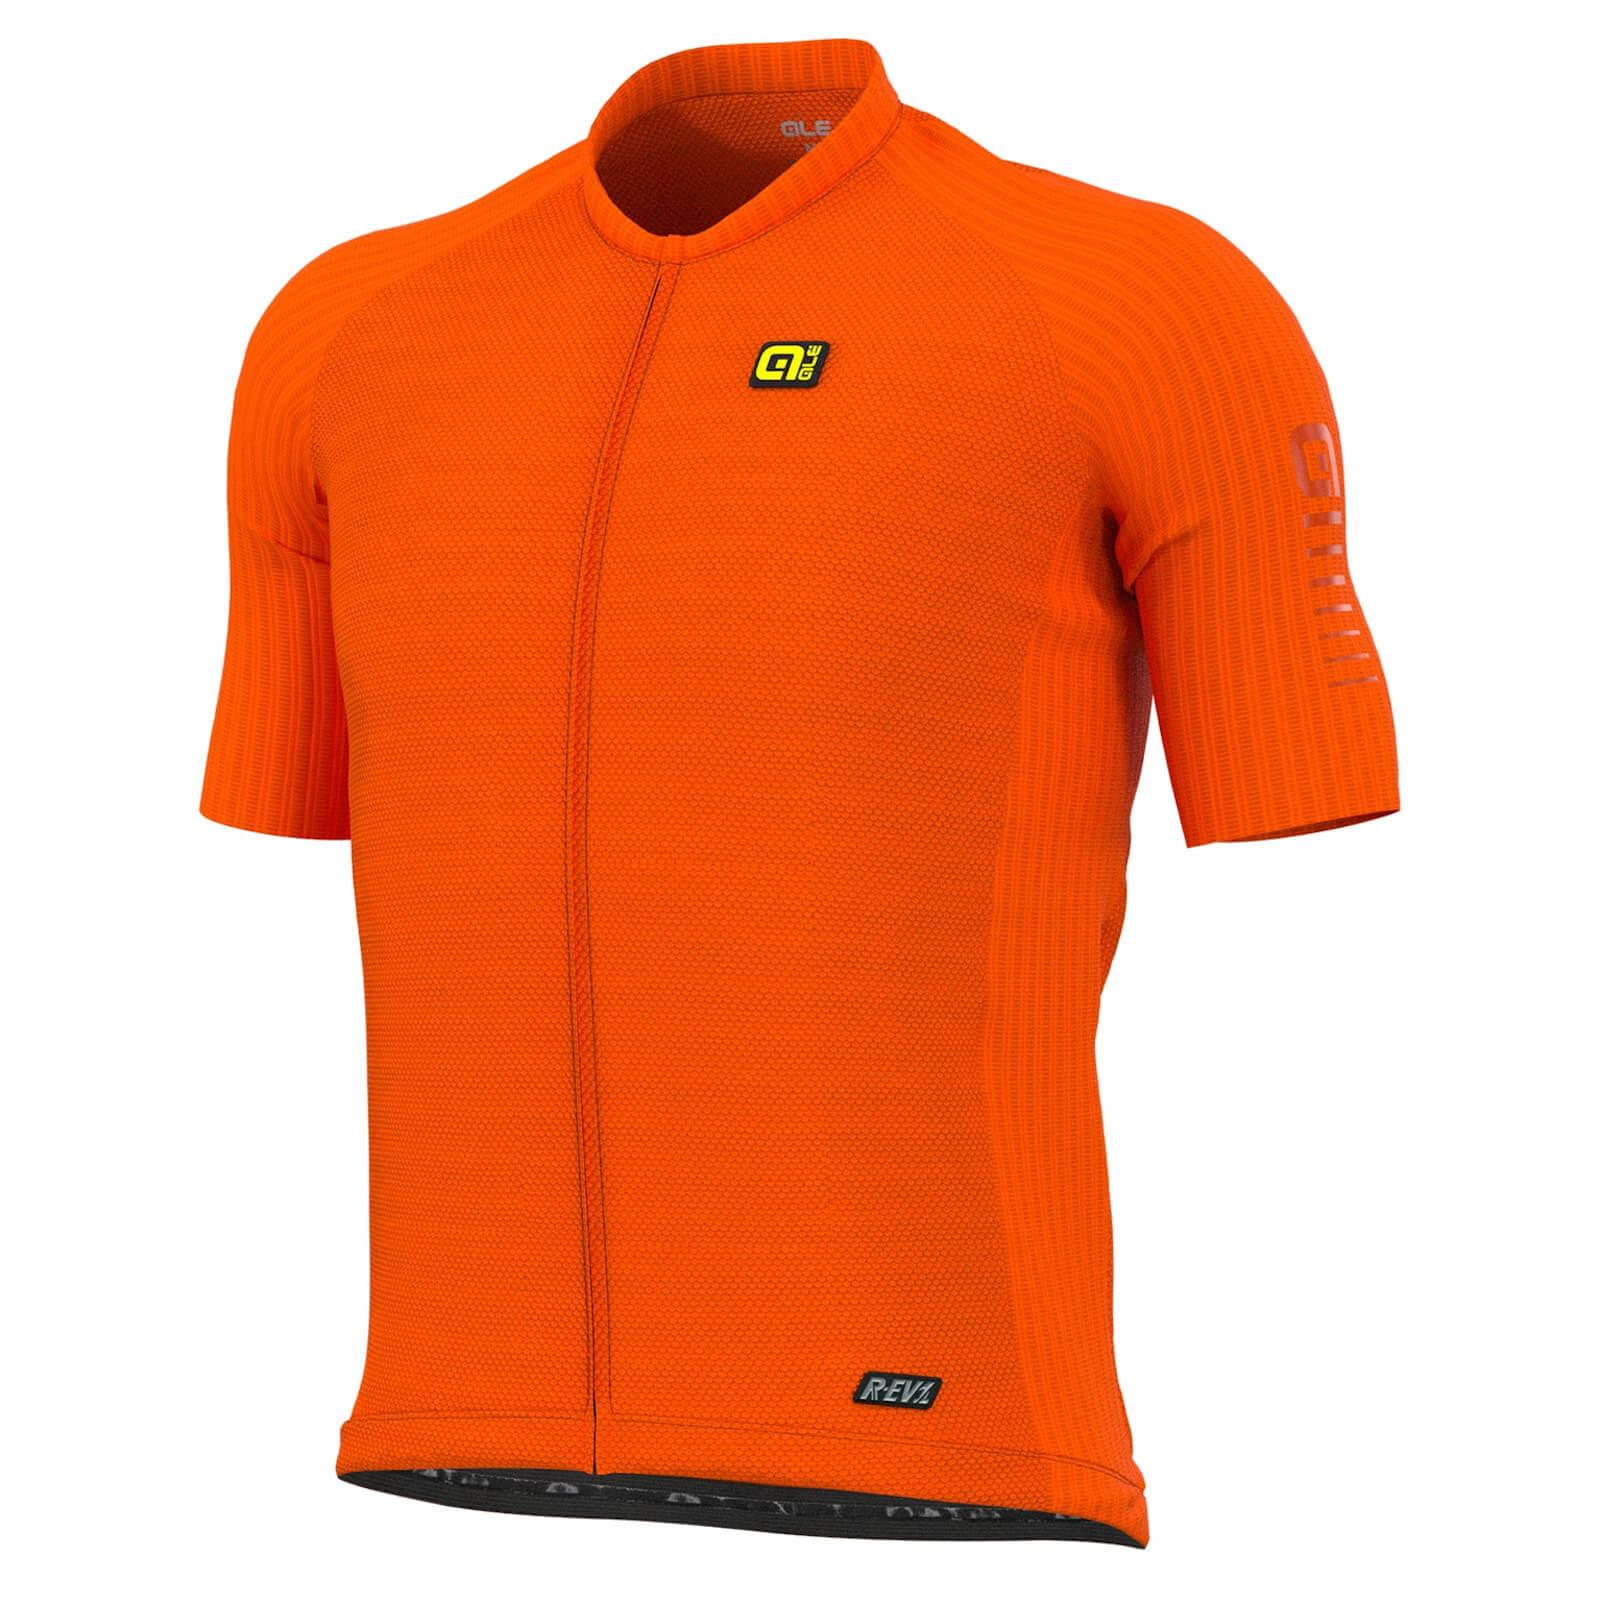 Ale R-EV1 Silver Cooling Jersey - M - Fluo Orange